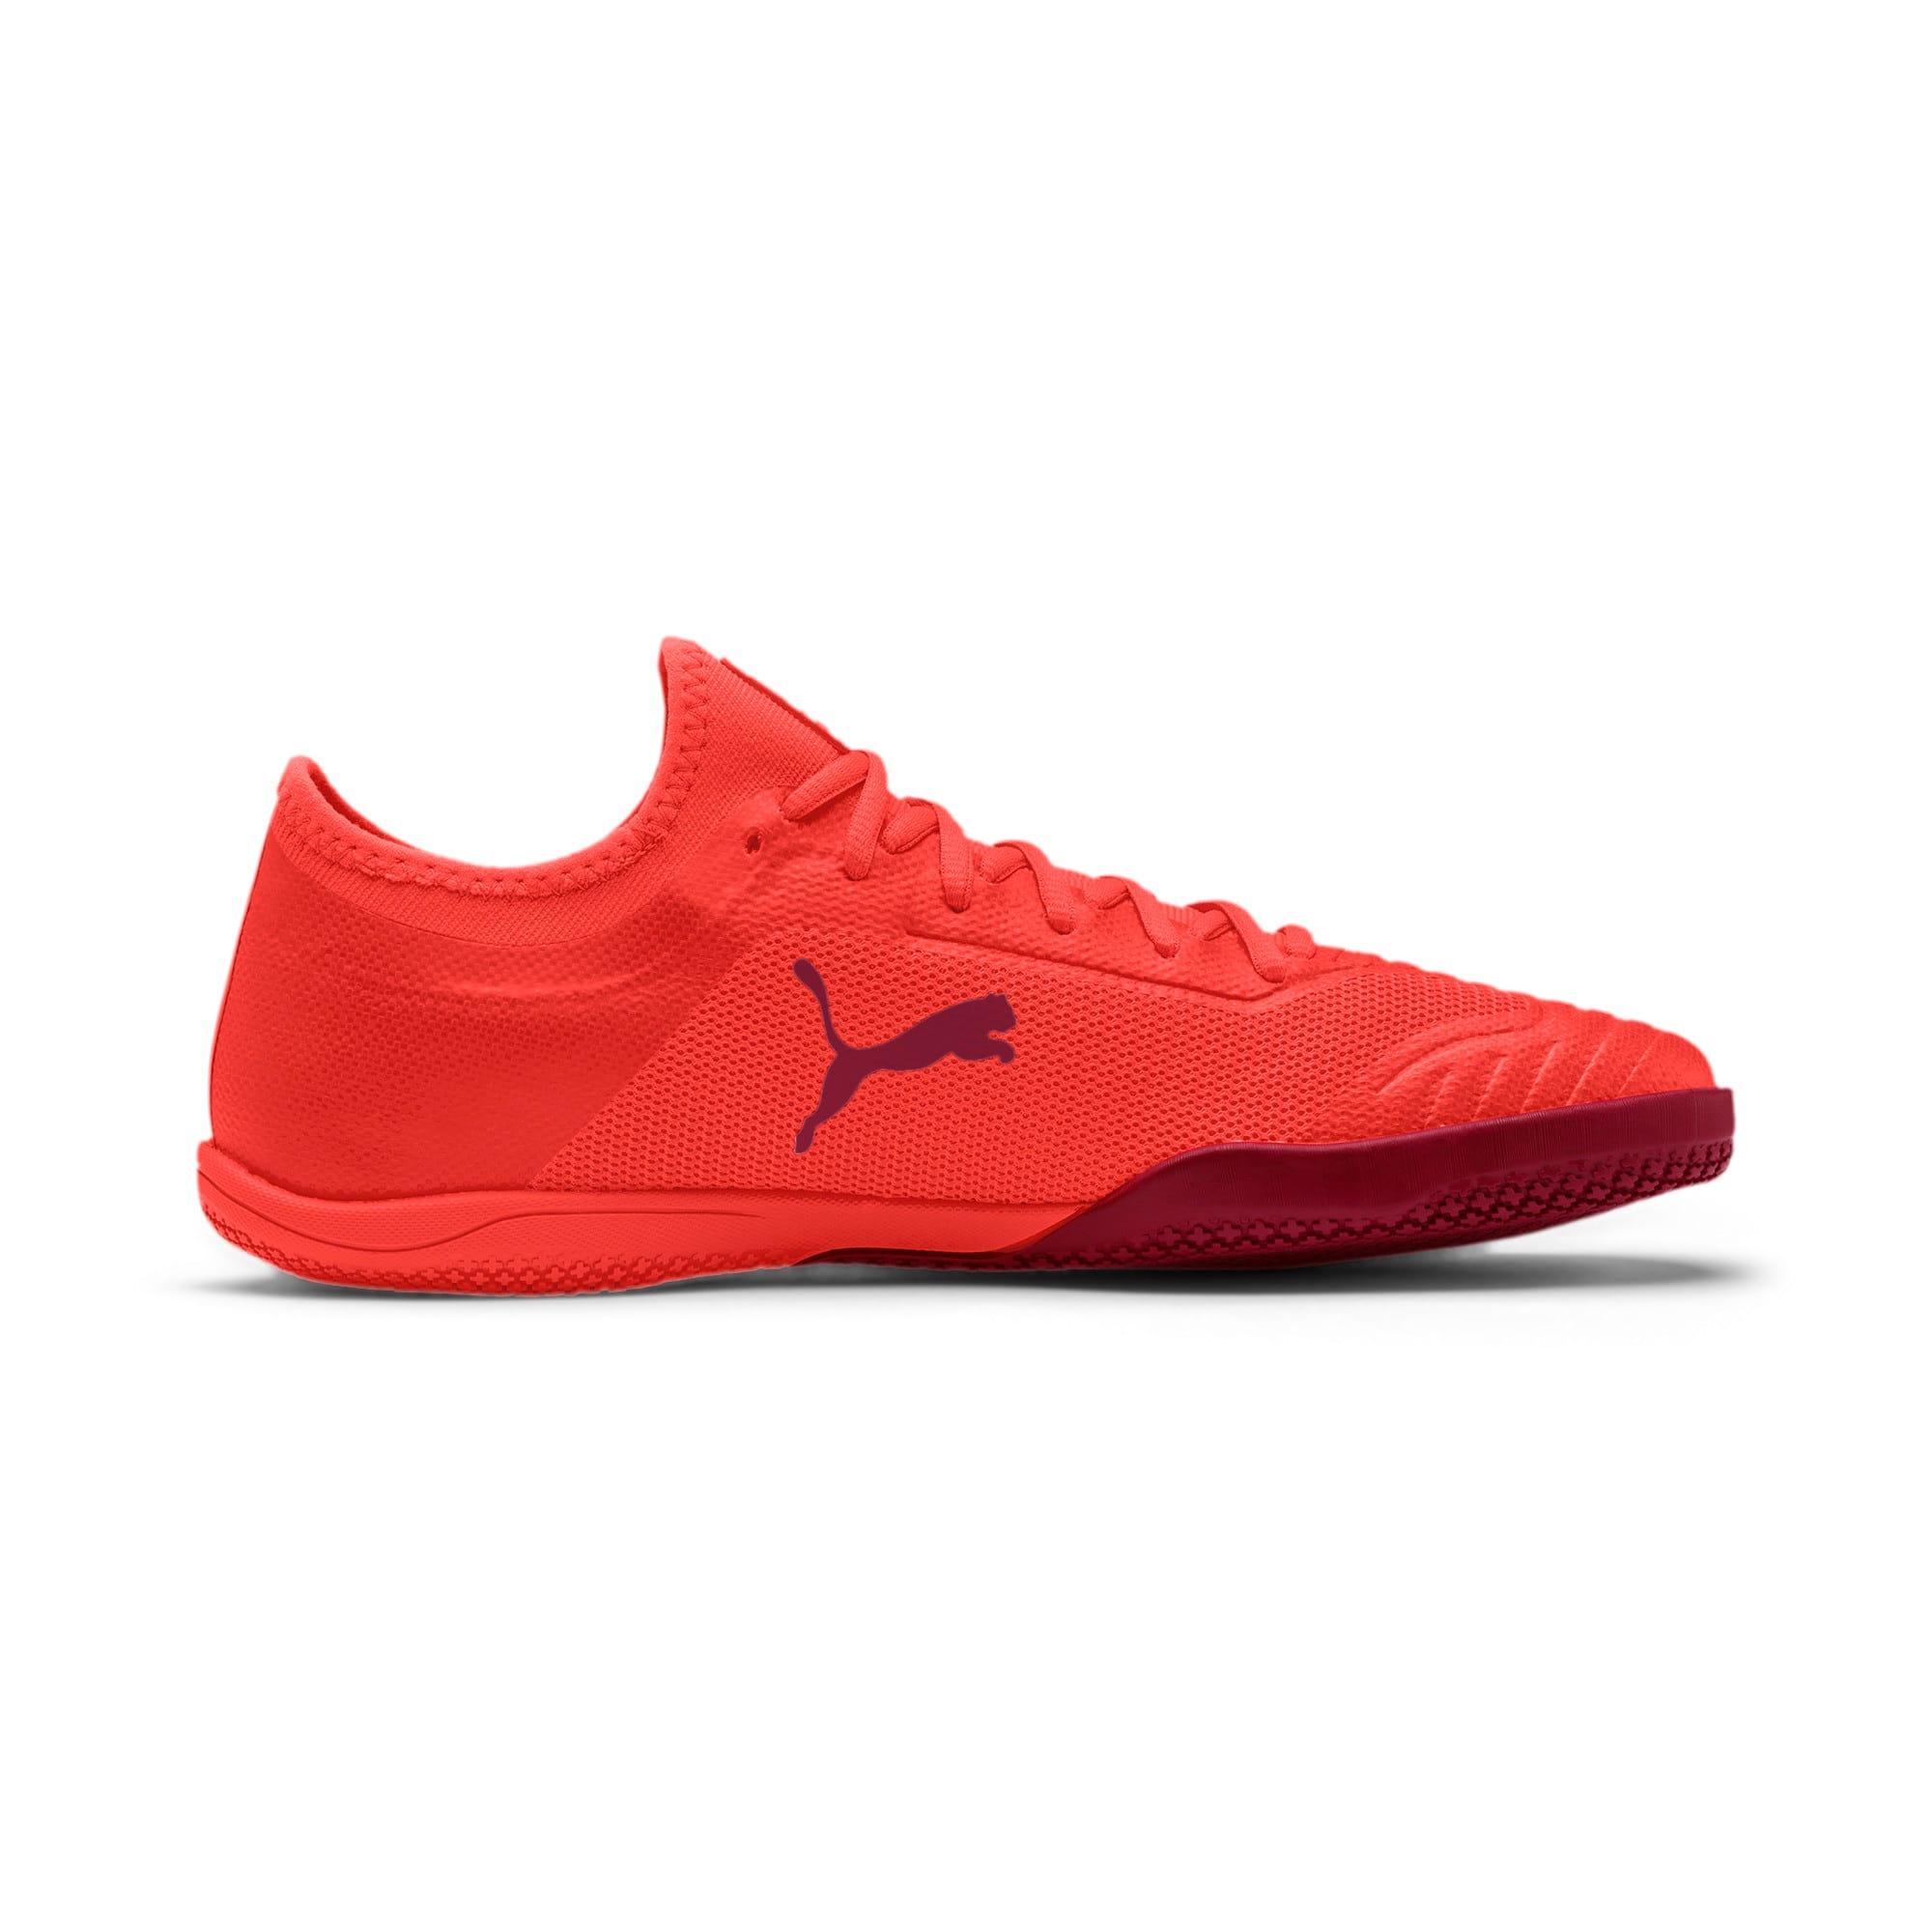 Thumbnail 6 of 365 Sala 1 Men's Soccer Shoes, Nrgy Red-Rhubarb, medium